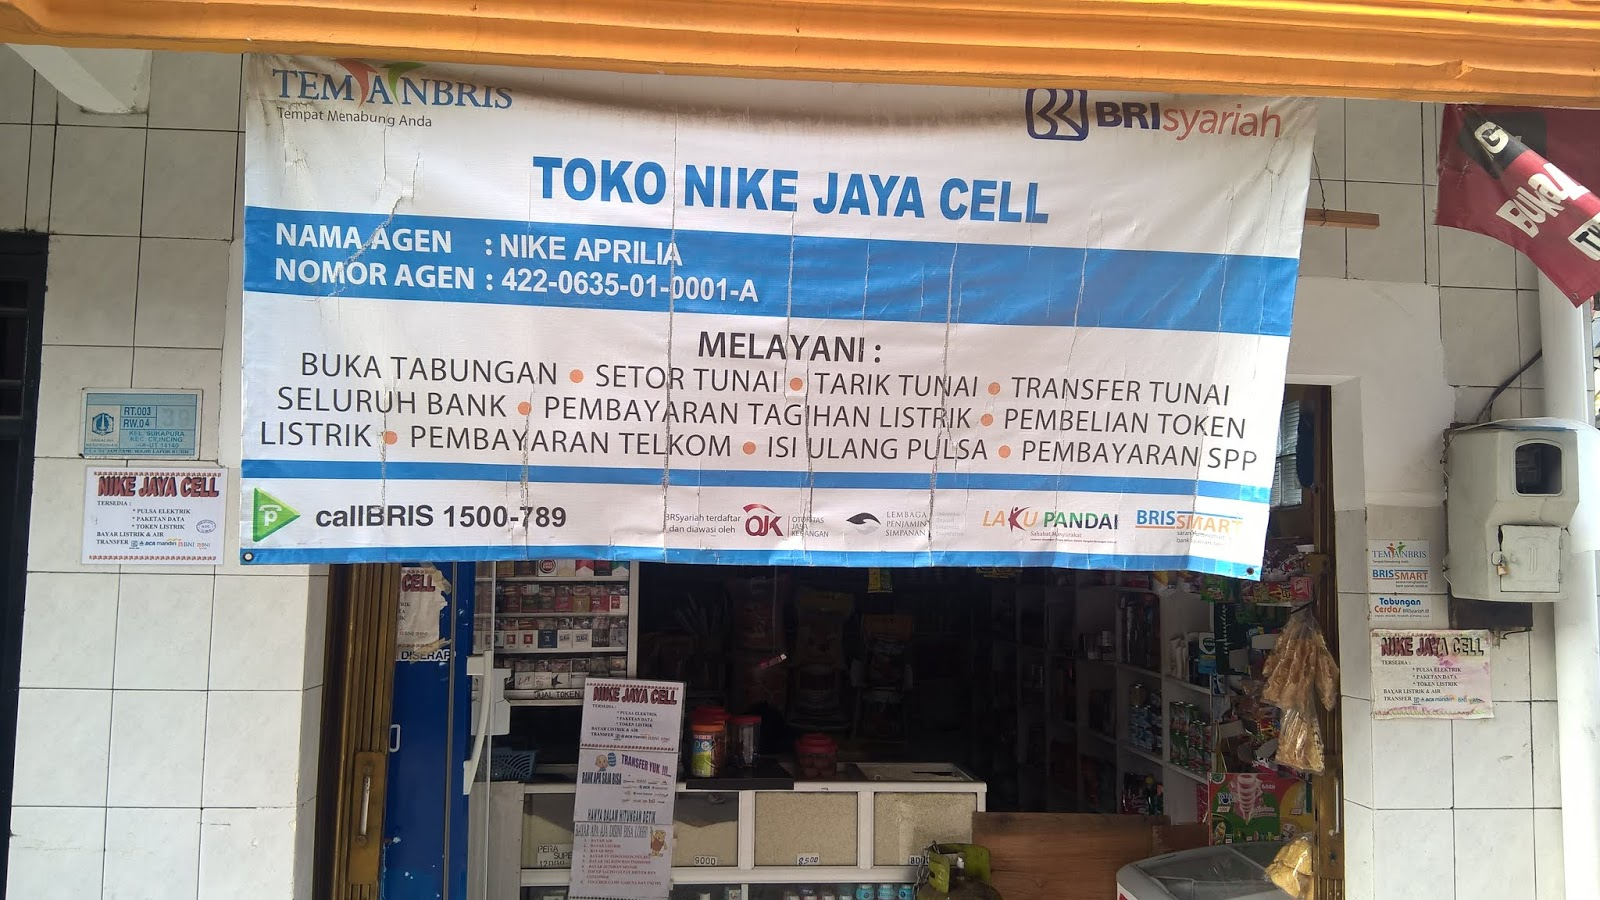 Toko Nike Jaya Cell Sukapura